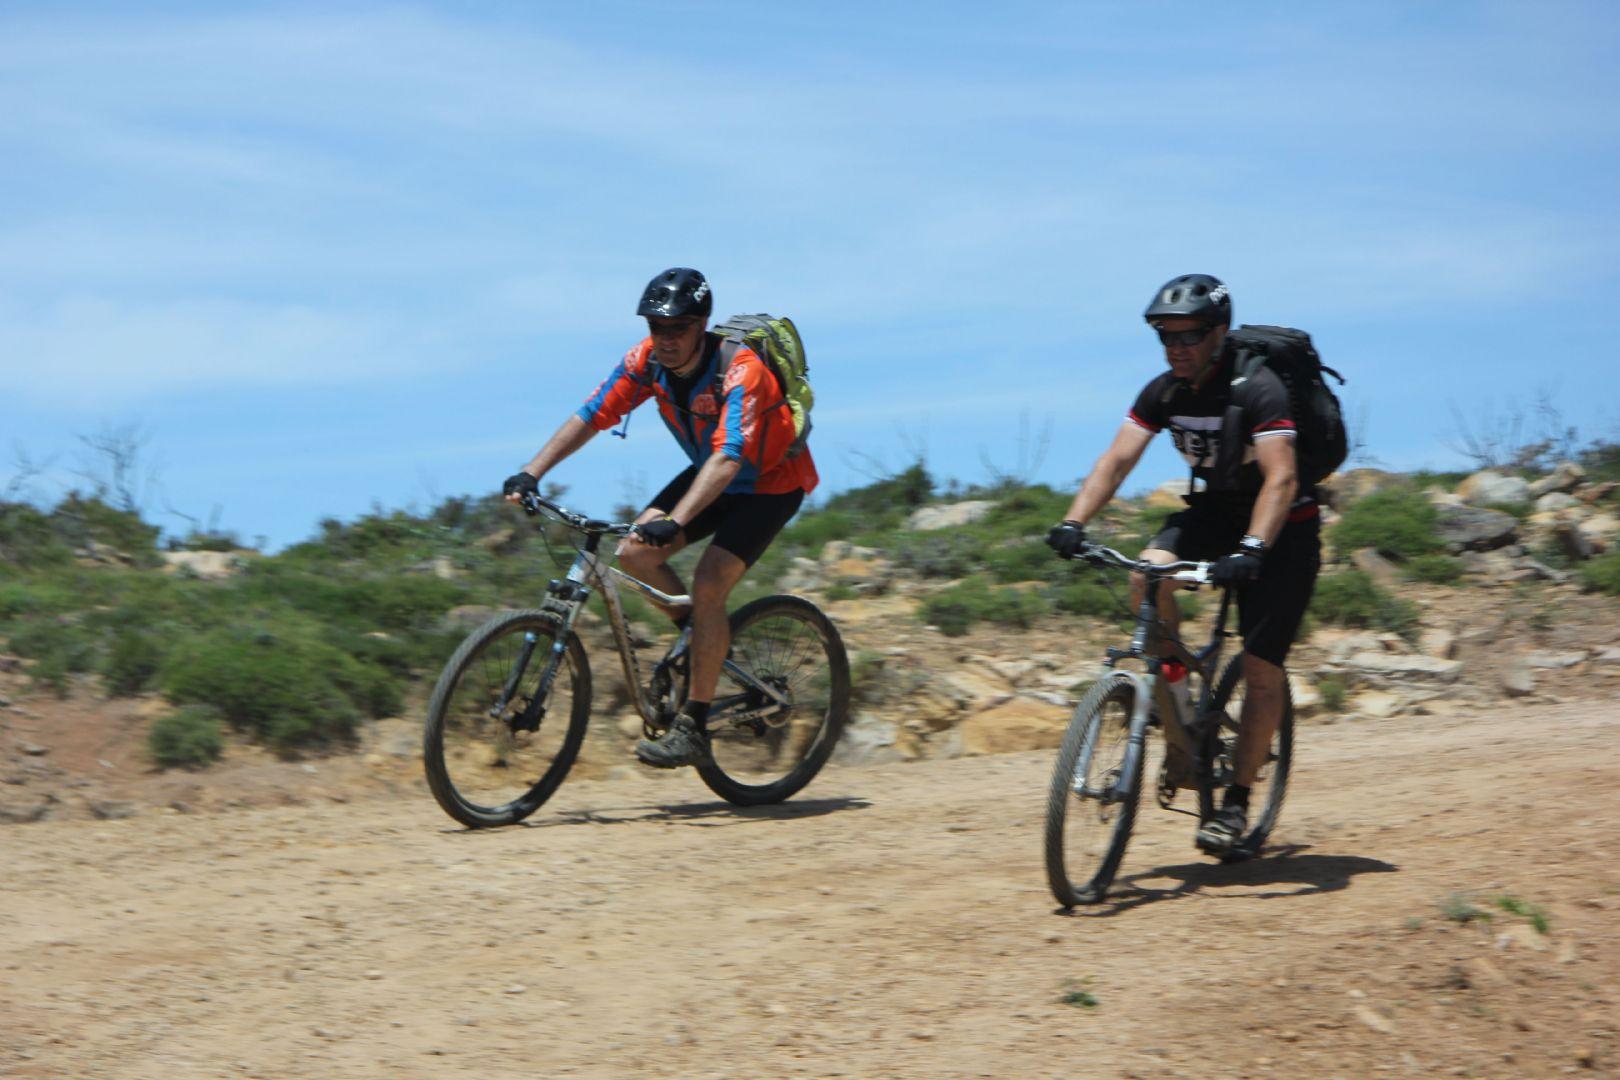 IMG_9260.JPG - Spain - Trans Andaluz - Guided Mountain Bike Holiday - Mountain Biking